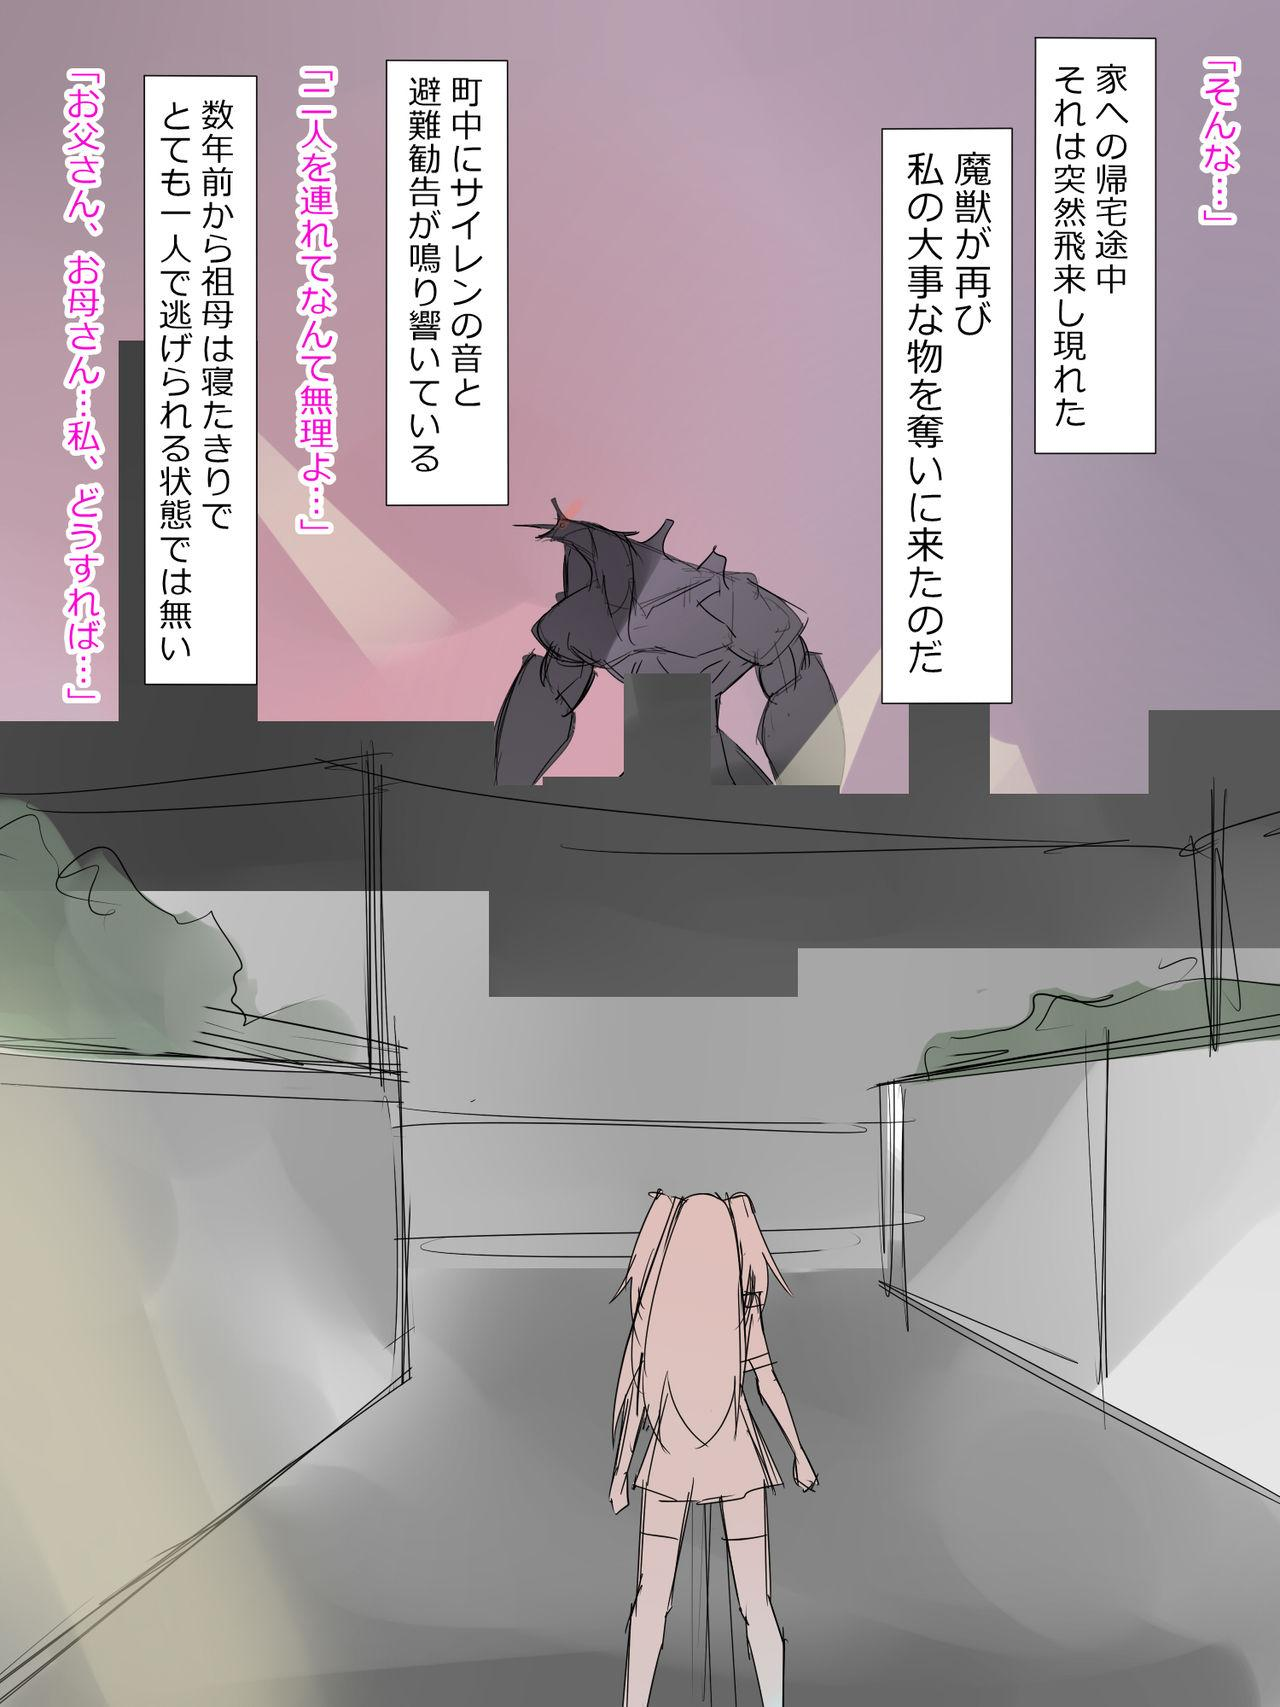 [Kagemusha] Arima-kun to 40-nin no Classmate 17